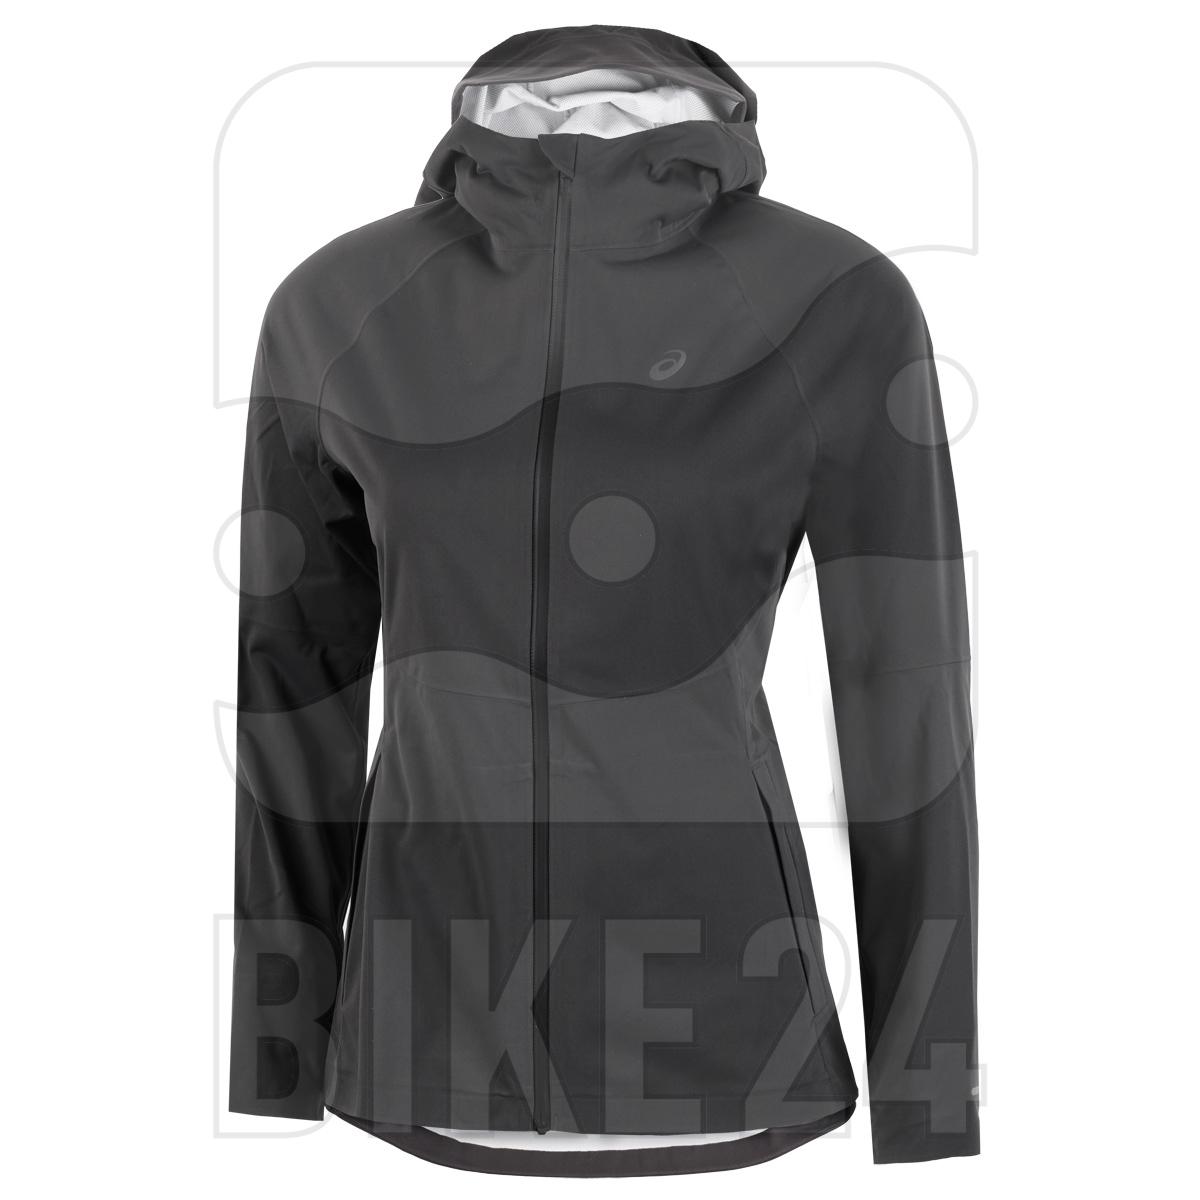 asics Accelerate Run Jacke Damen - graphite grey